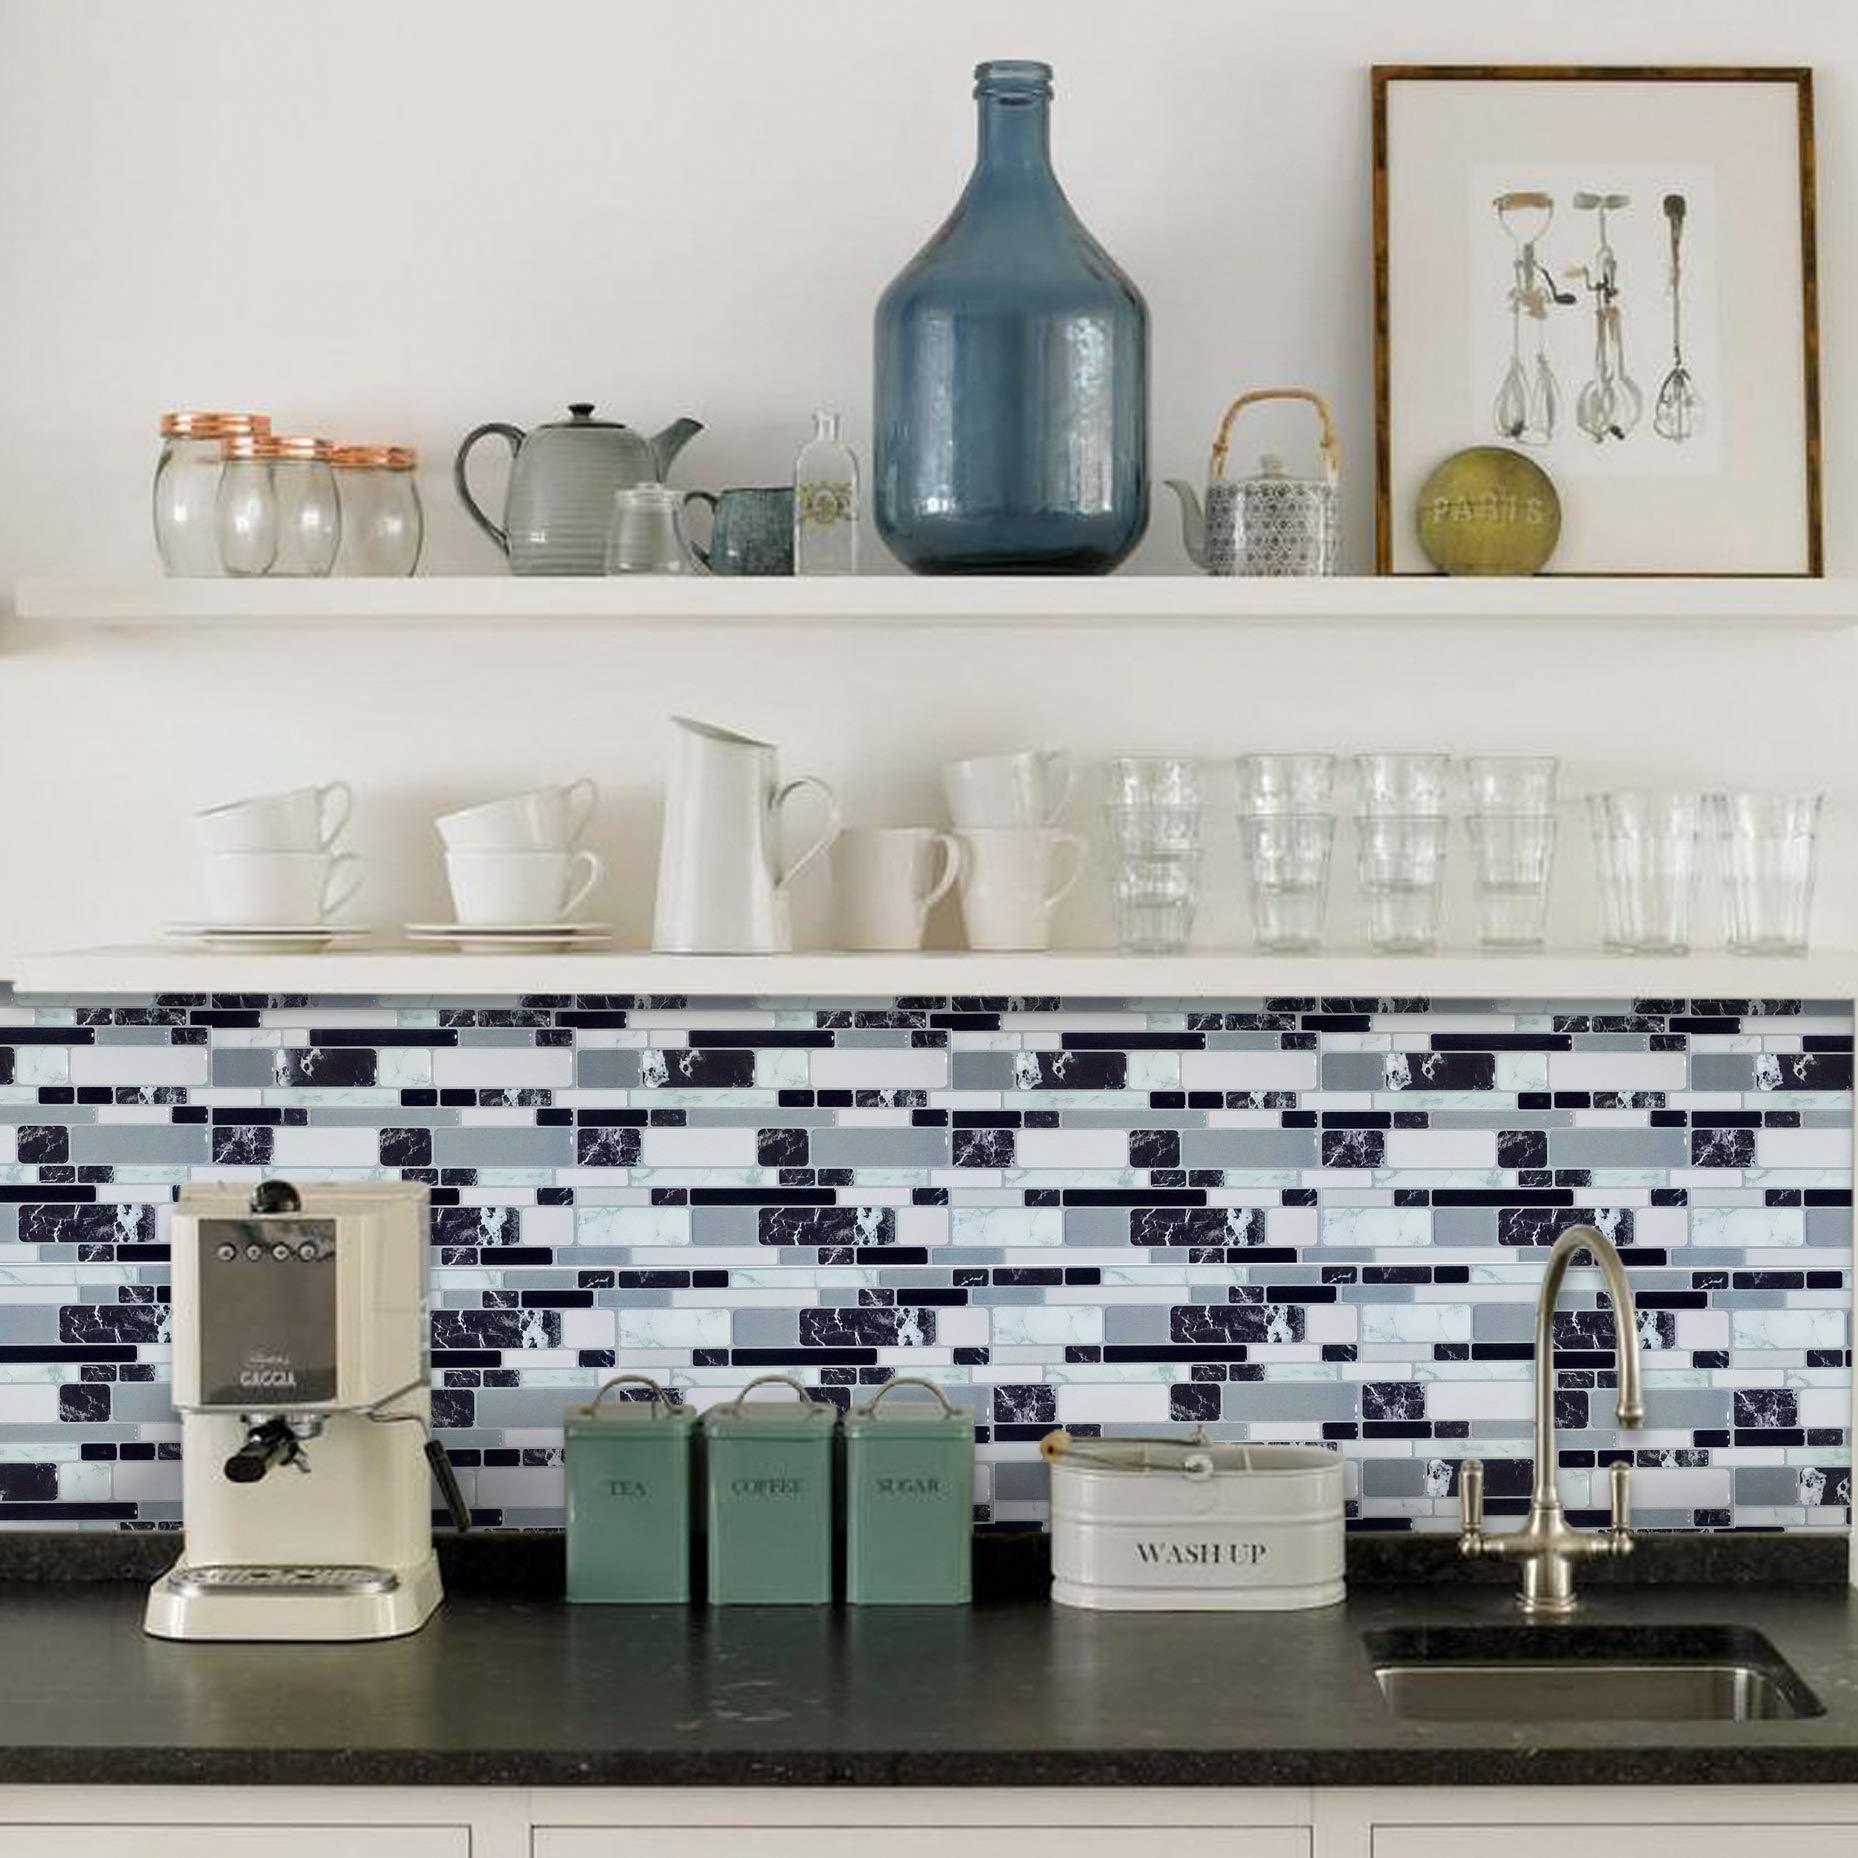 Amazon Com Peel And Stick Wall Tile For Kitchen Backsplash Waterproof Backsplash Sticker Gray Brick Self Adhesive Mosaic Backsplash For Bathroom Marble Design 10 X10 Gray White Tile 8 Pack Kitchen Dining